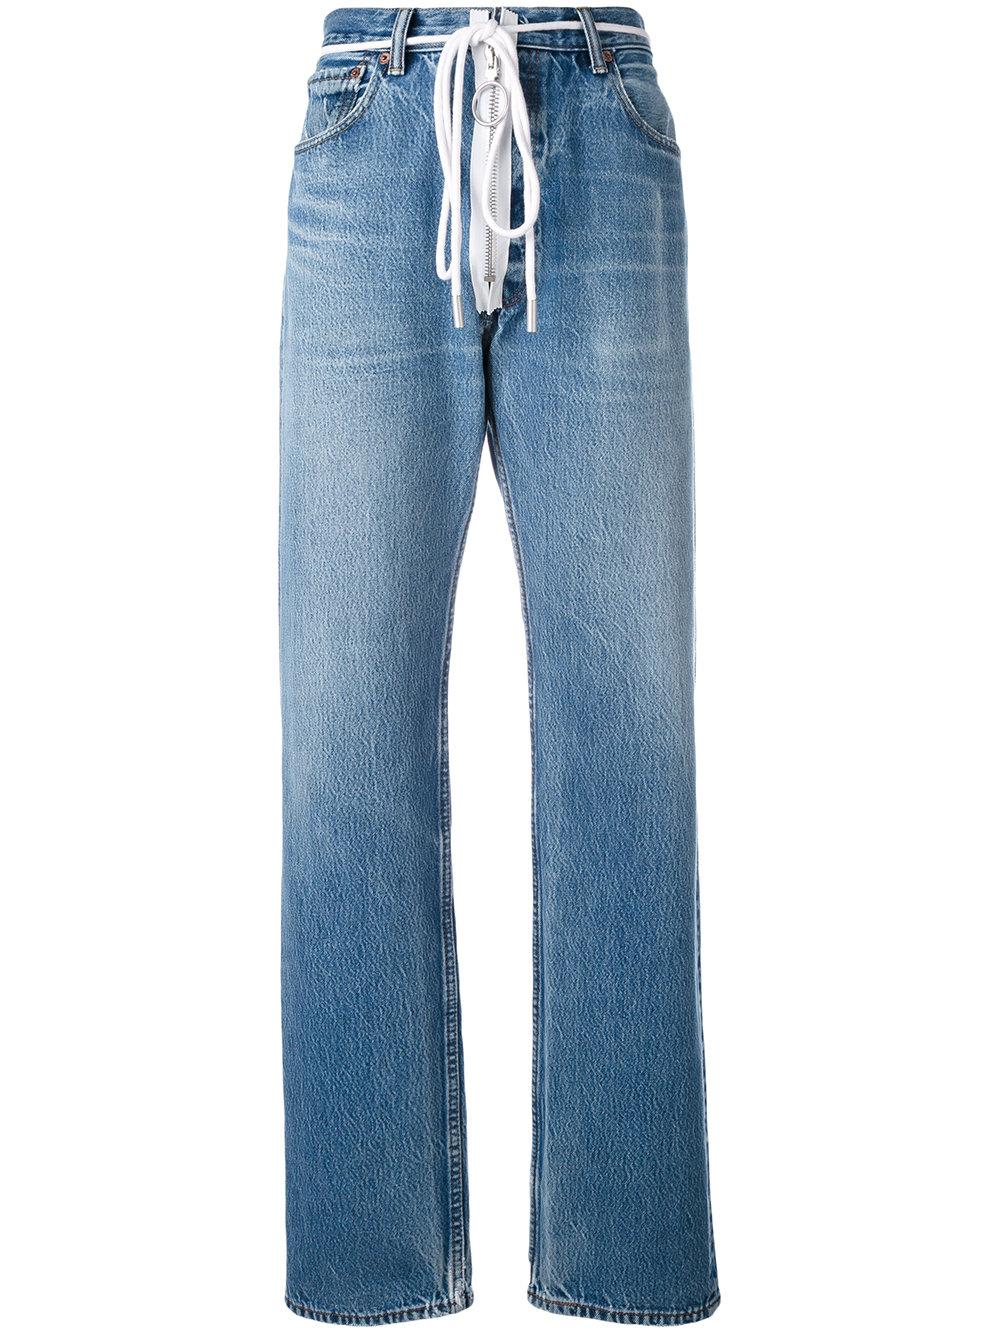 405ccdea Off-White Zip Detail Levi Jeans - Farfetch